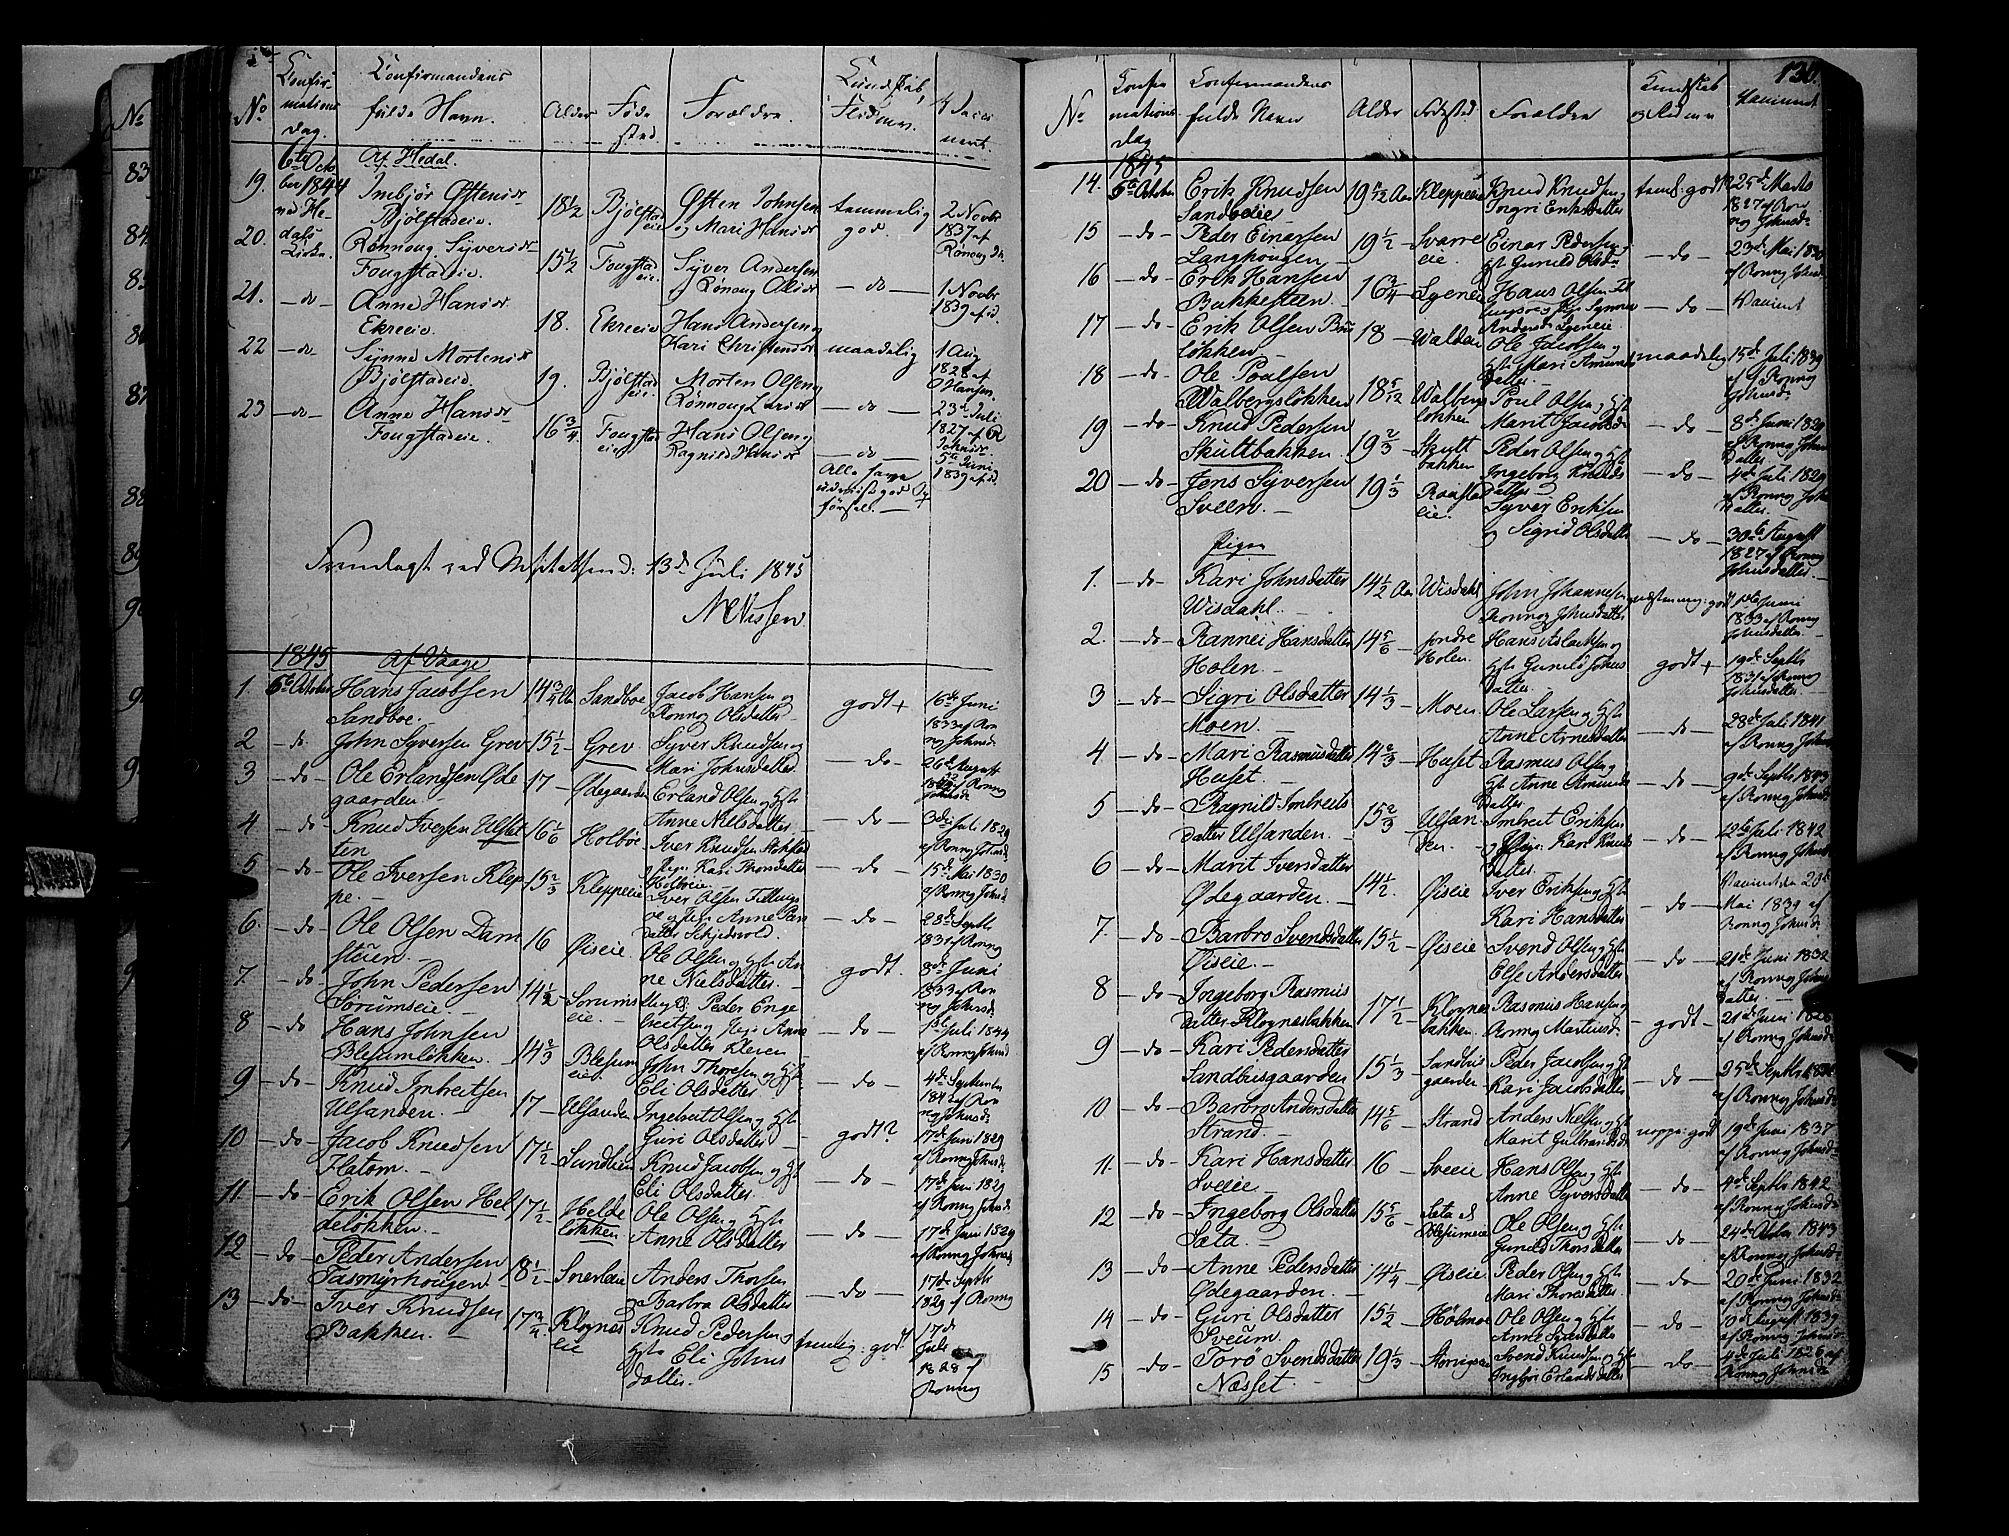 SAH, Vågå prestekontor, Ministerialbok nr. 5 /1, 1842-1856, s. 130